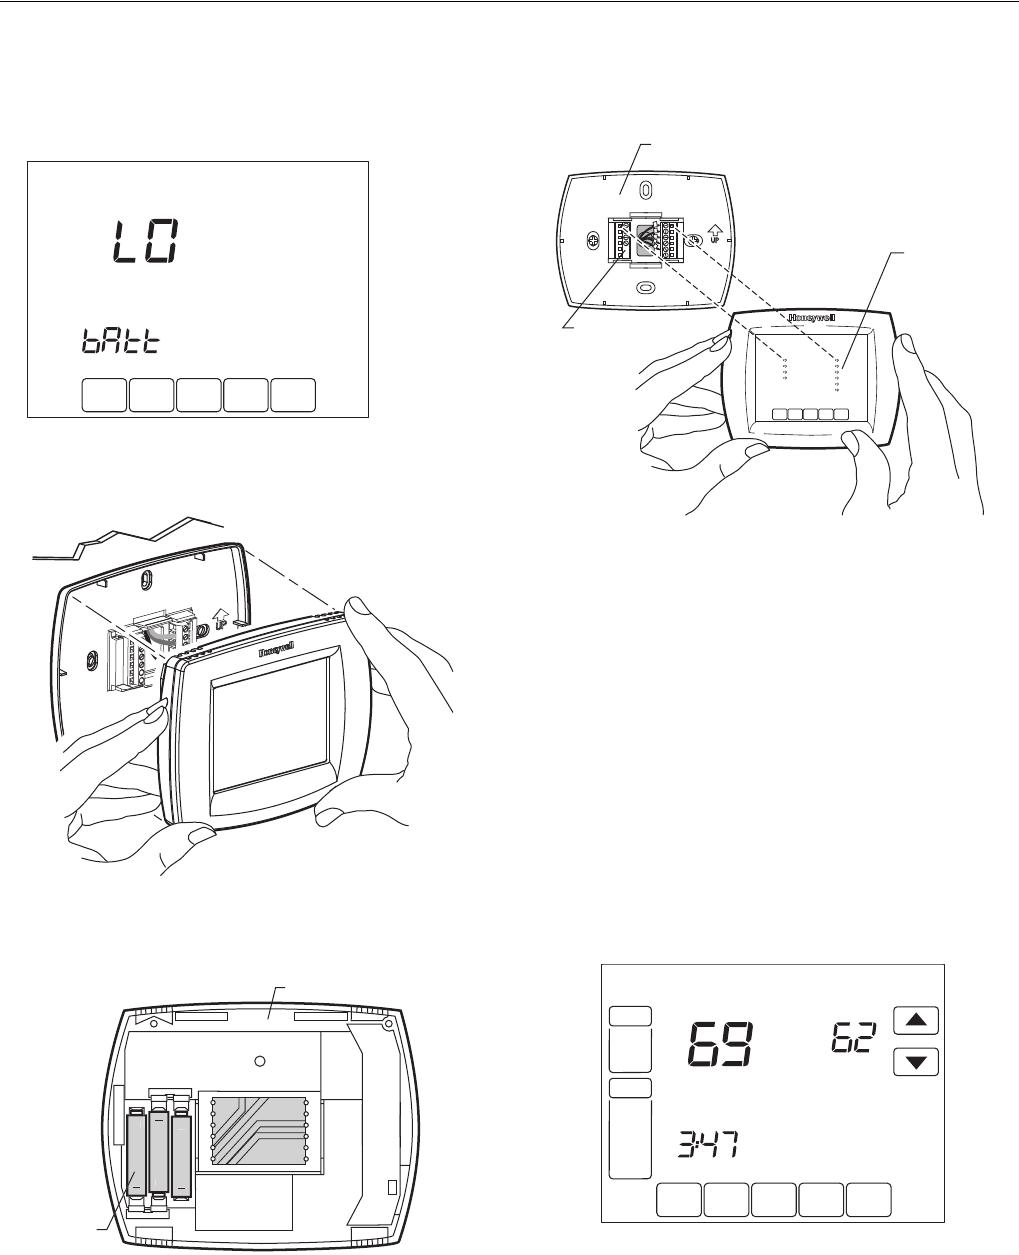 Honeywell Visionpro Th8110 Users Manual 68 0280—01 8000